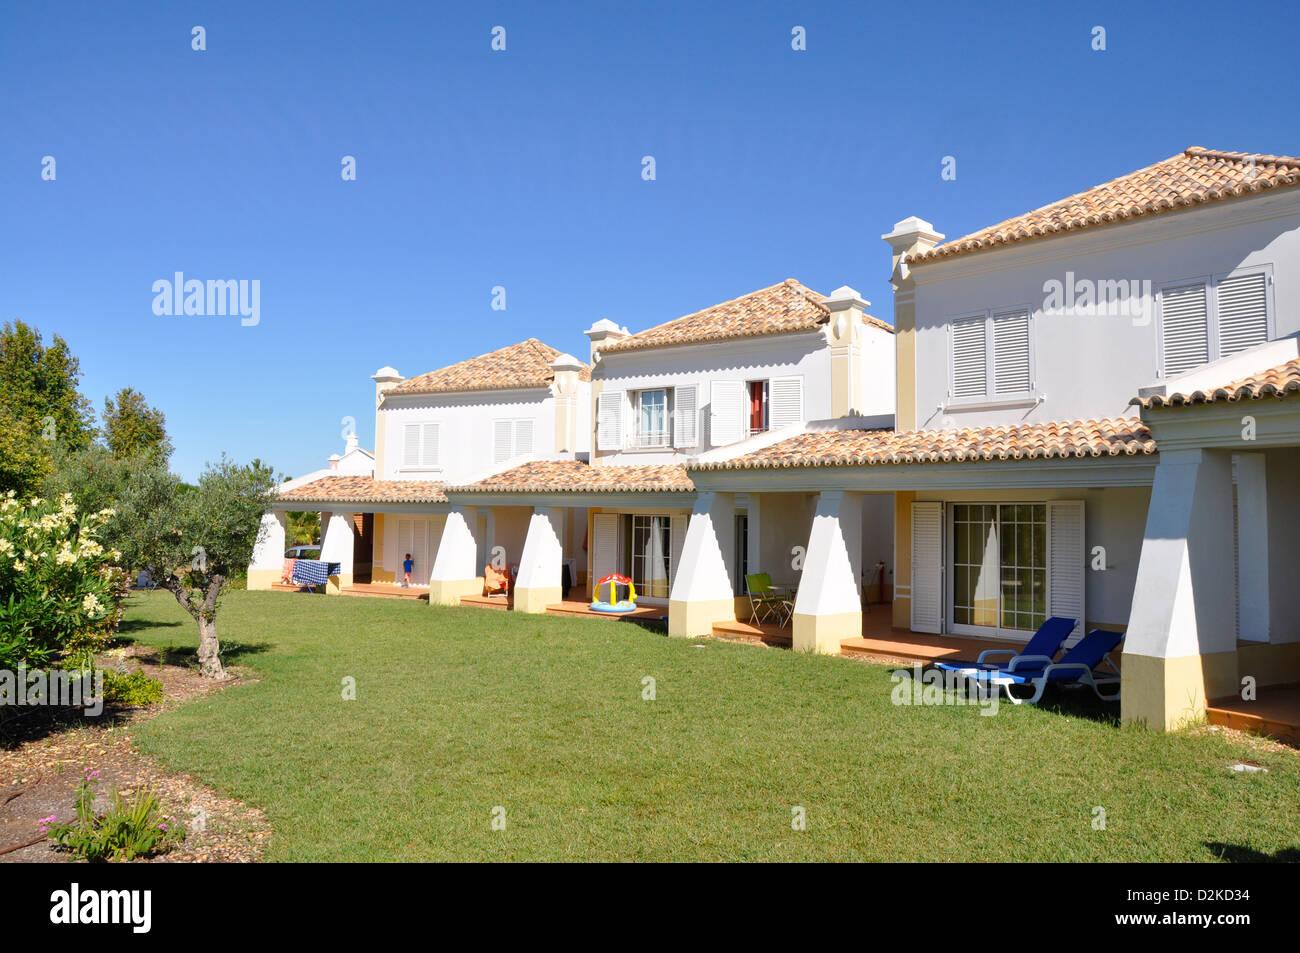 Holiday villas Gale, Algarve, Portugal Europe - Stock Image